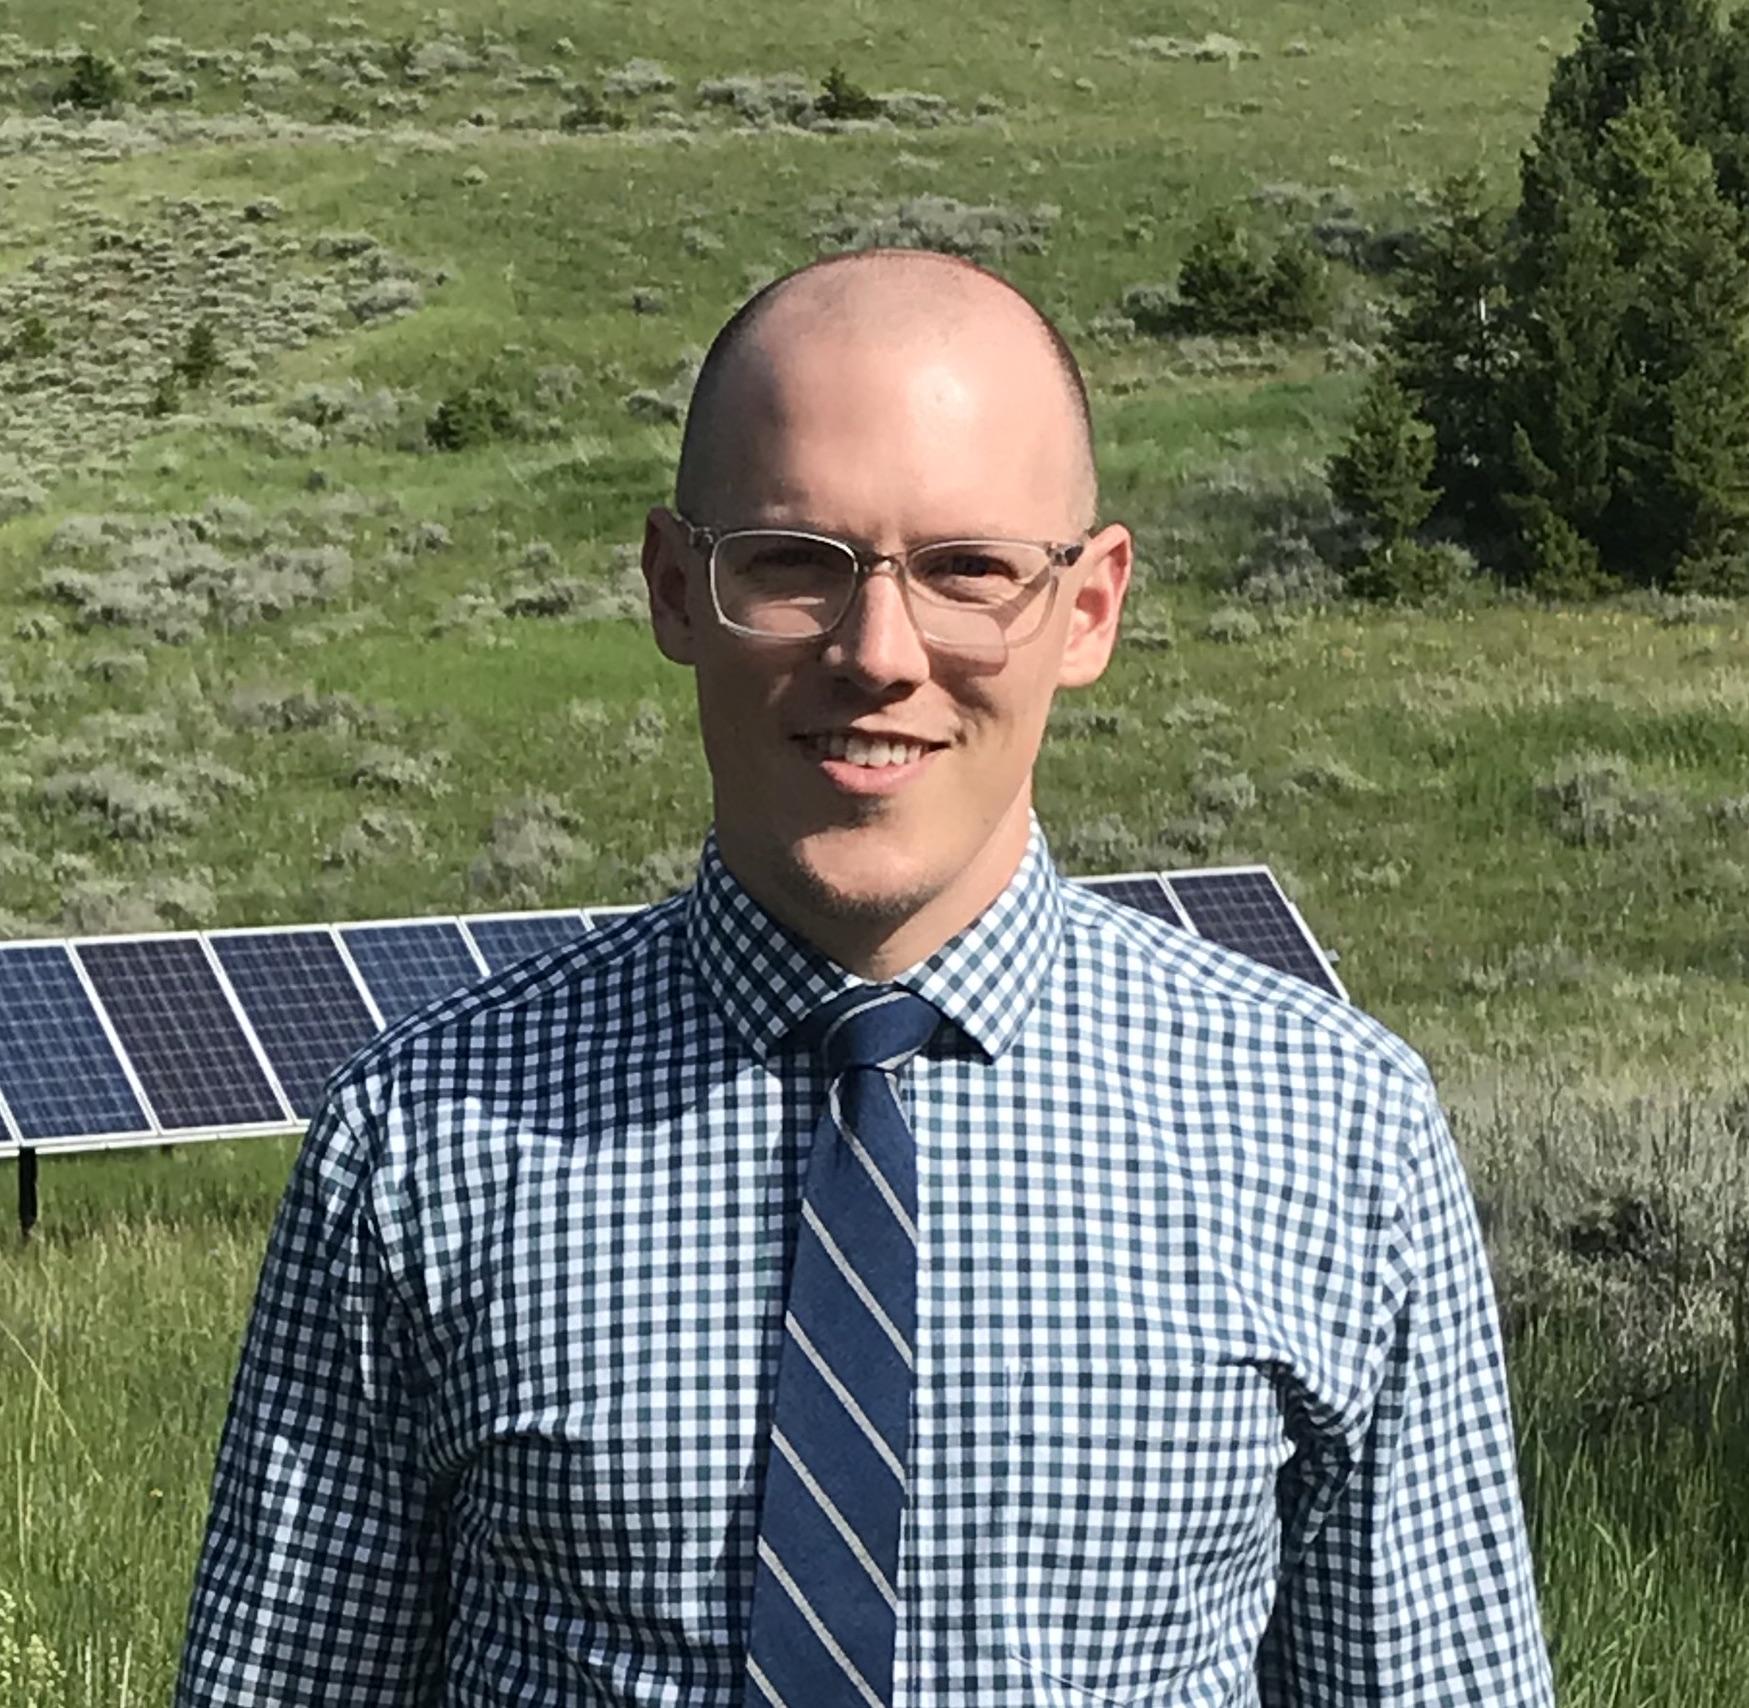 <b>Peter Murphy</b> <br>Midwest Renewable Energy Association